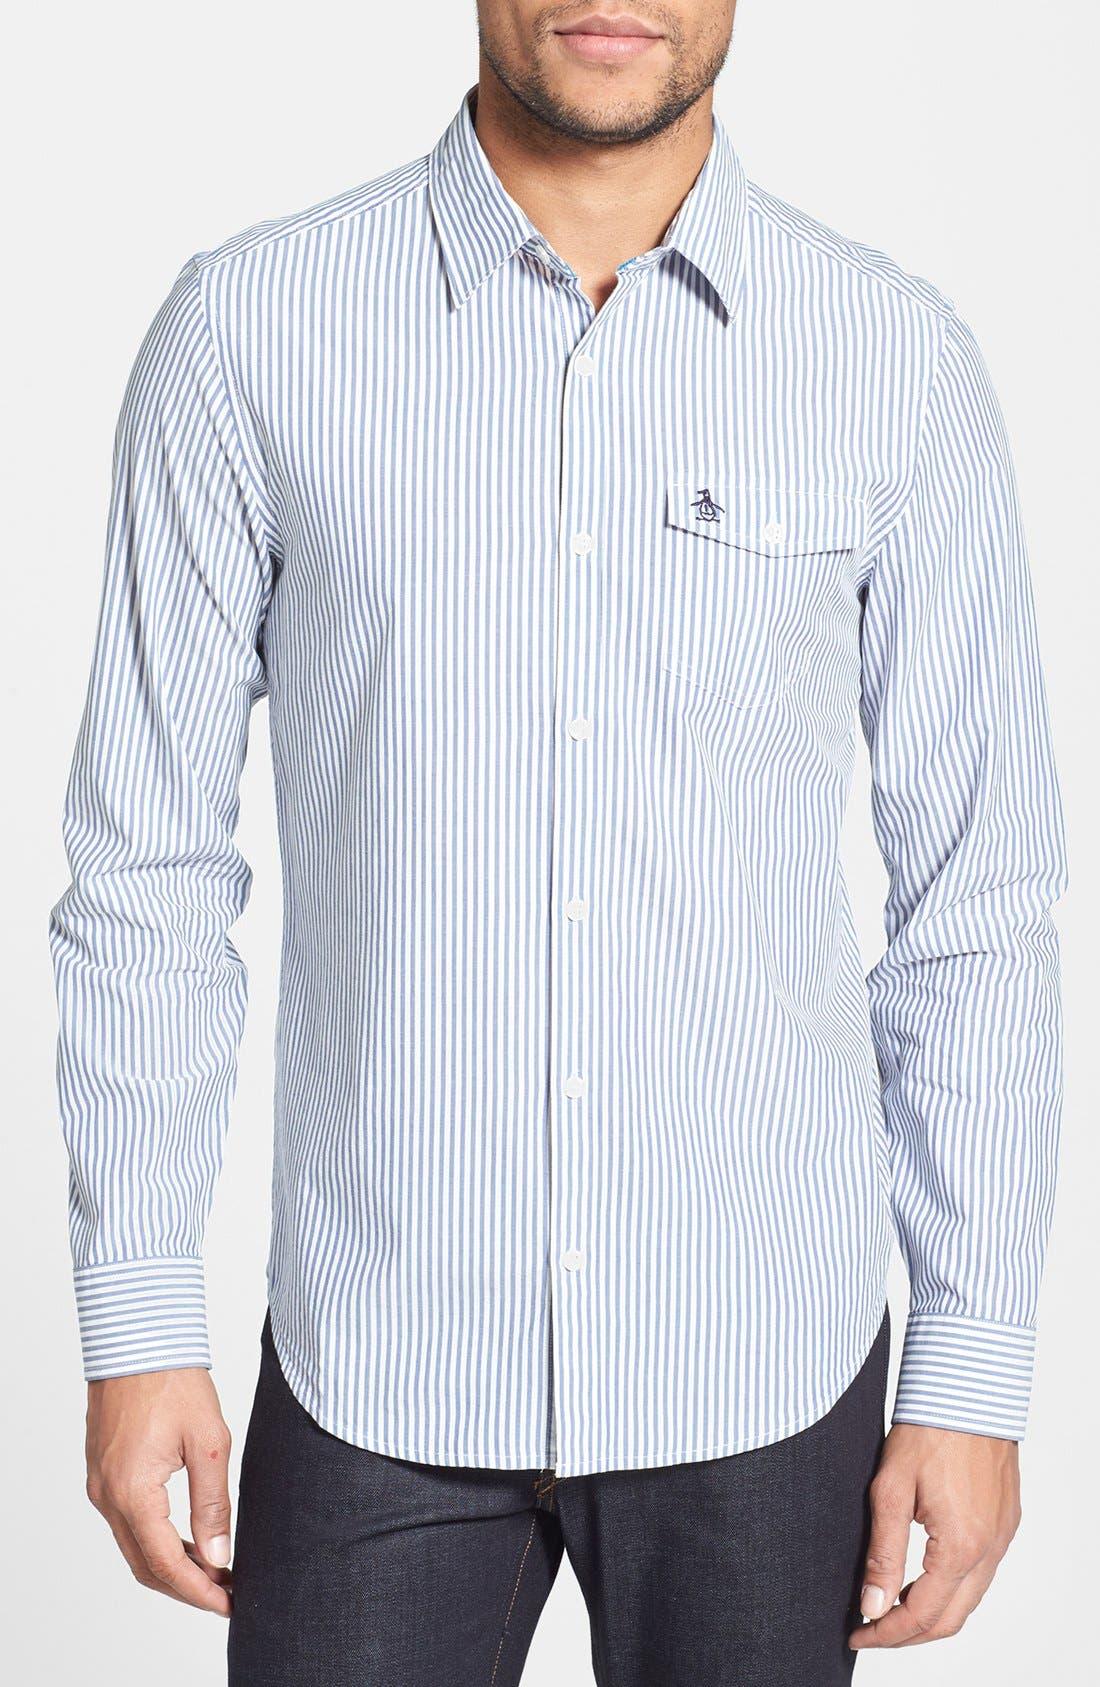 Alternate Image 1 Selected - Original Penguin Heritage Fit Stripe Sport Shirt